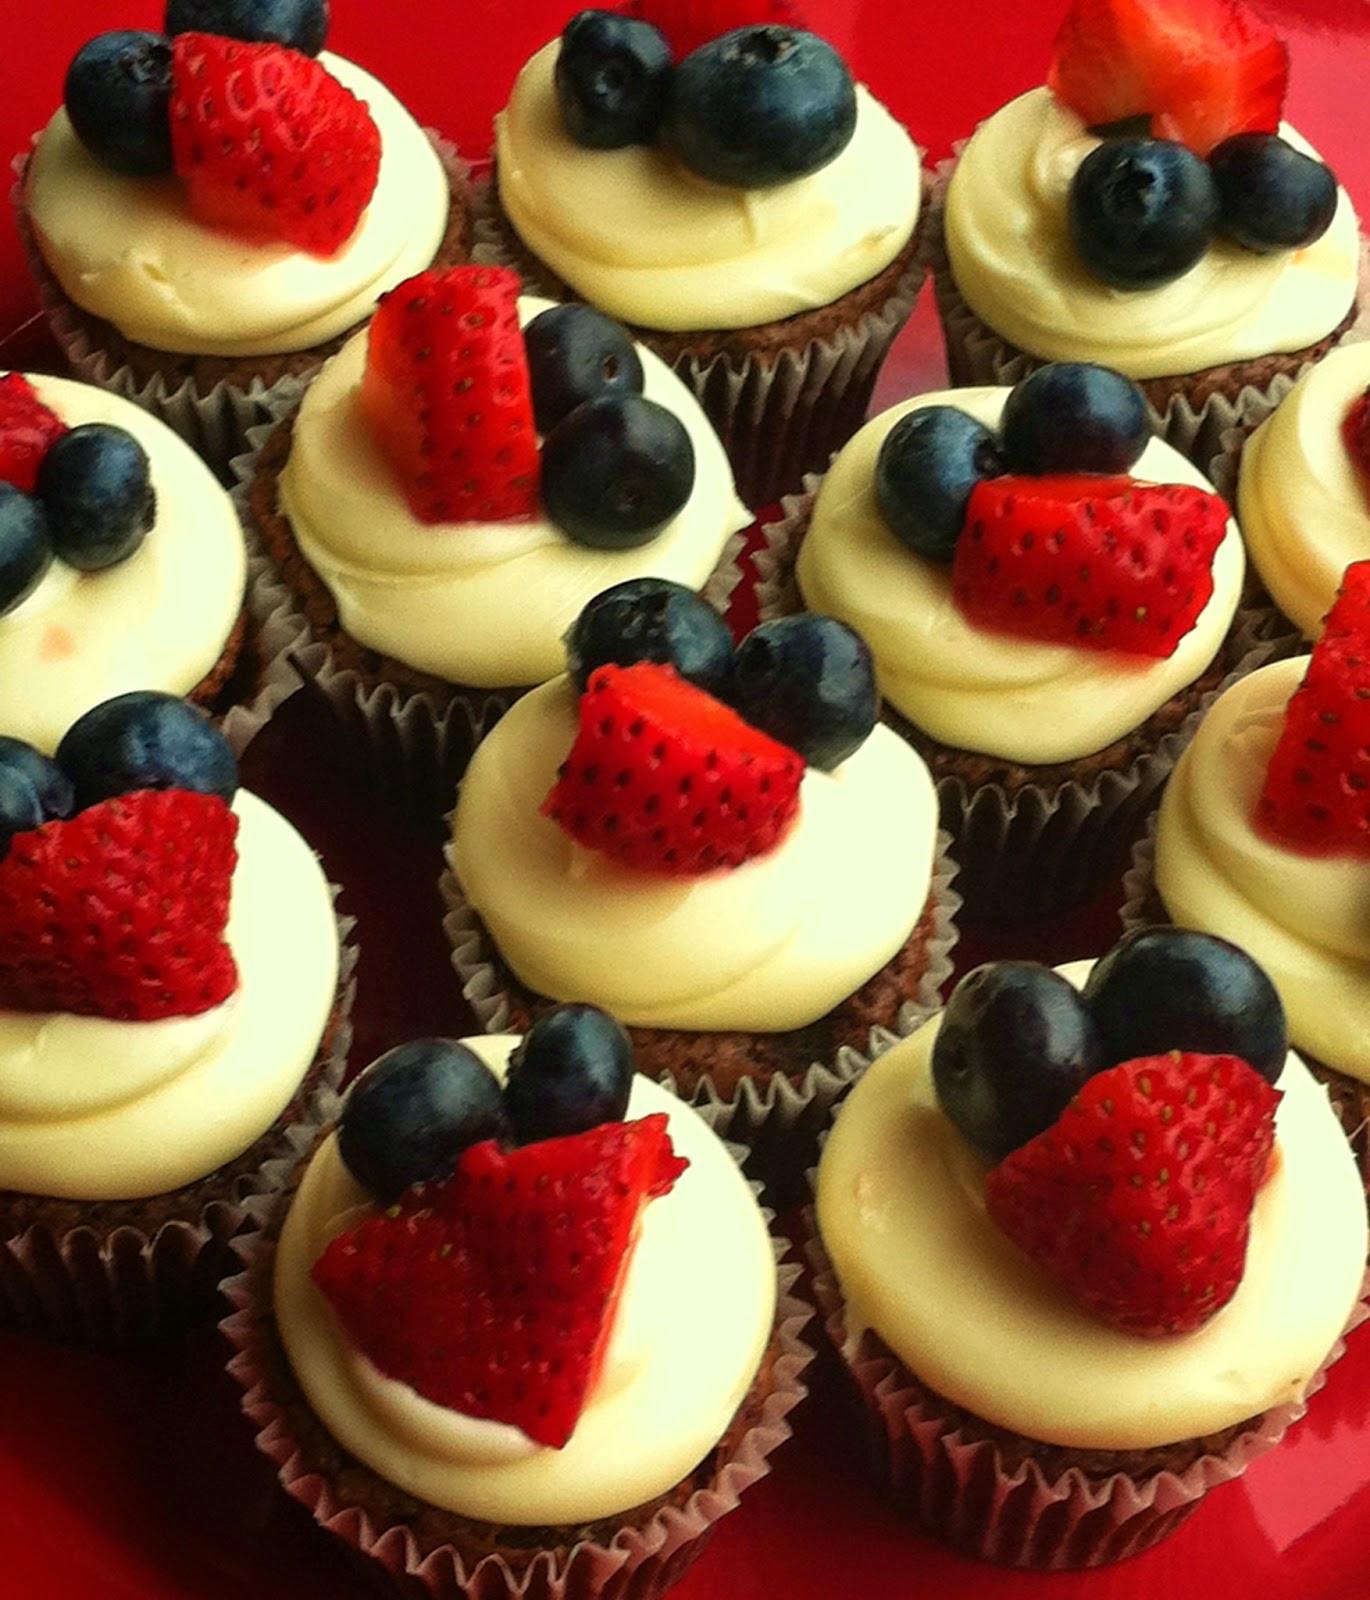 4Th July Desserts  Lola Pearl Bake Shoppe Easy 4th of July Dessert